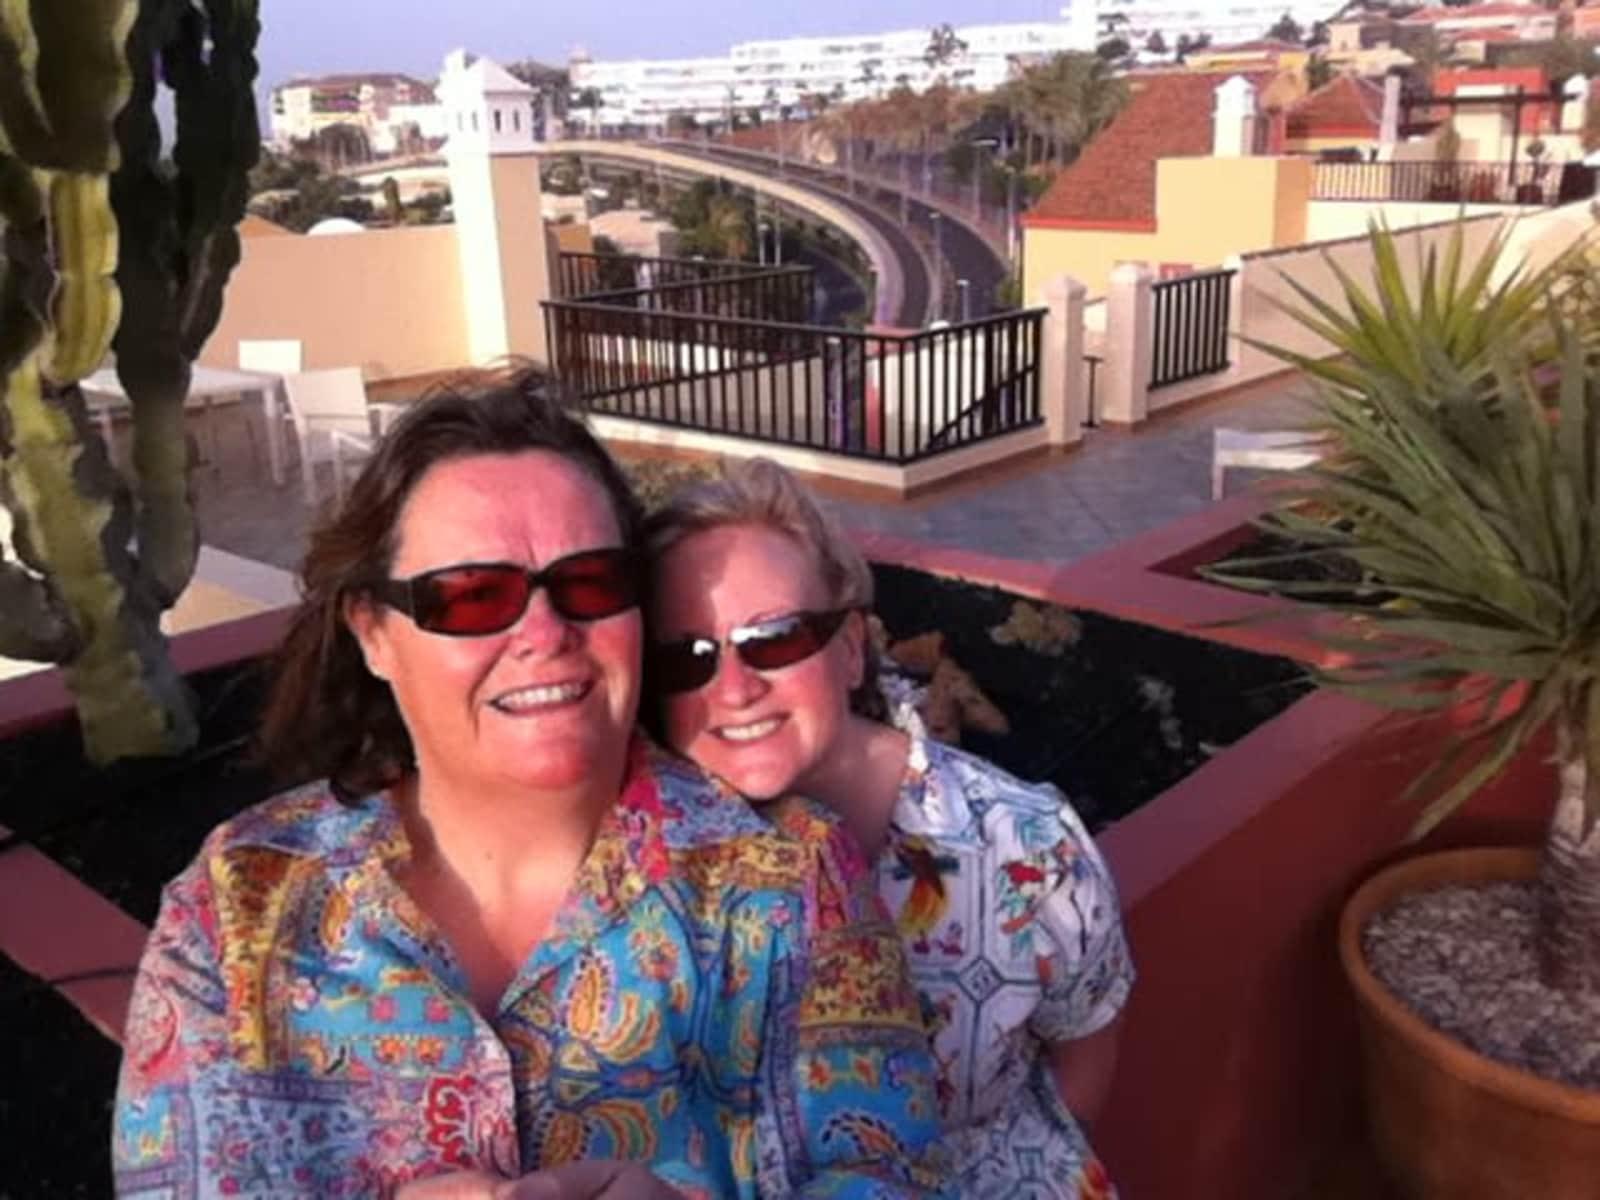 Helen & Janice from Dublin, Ireland